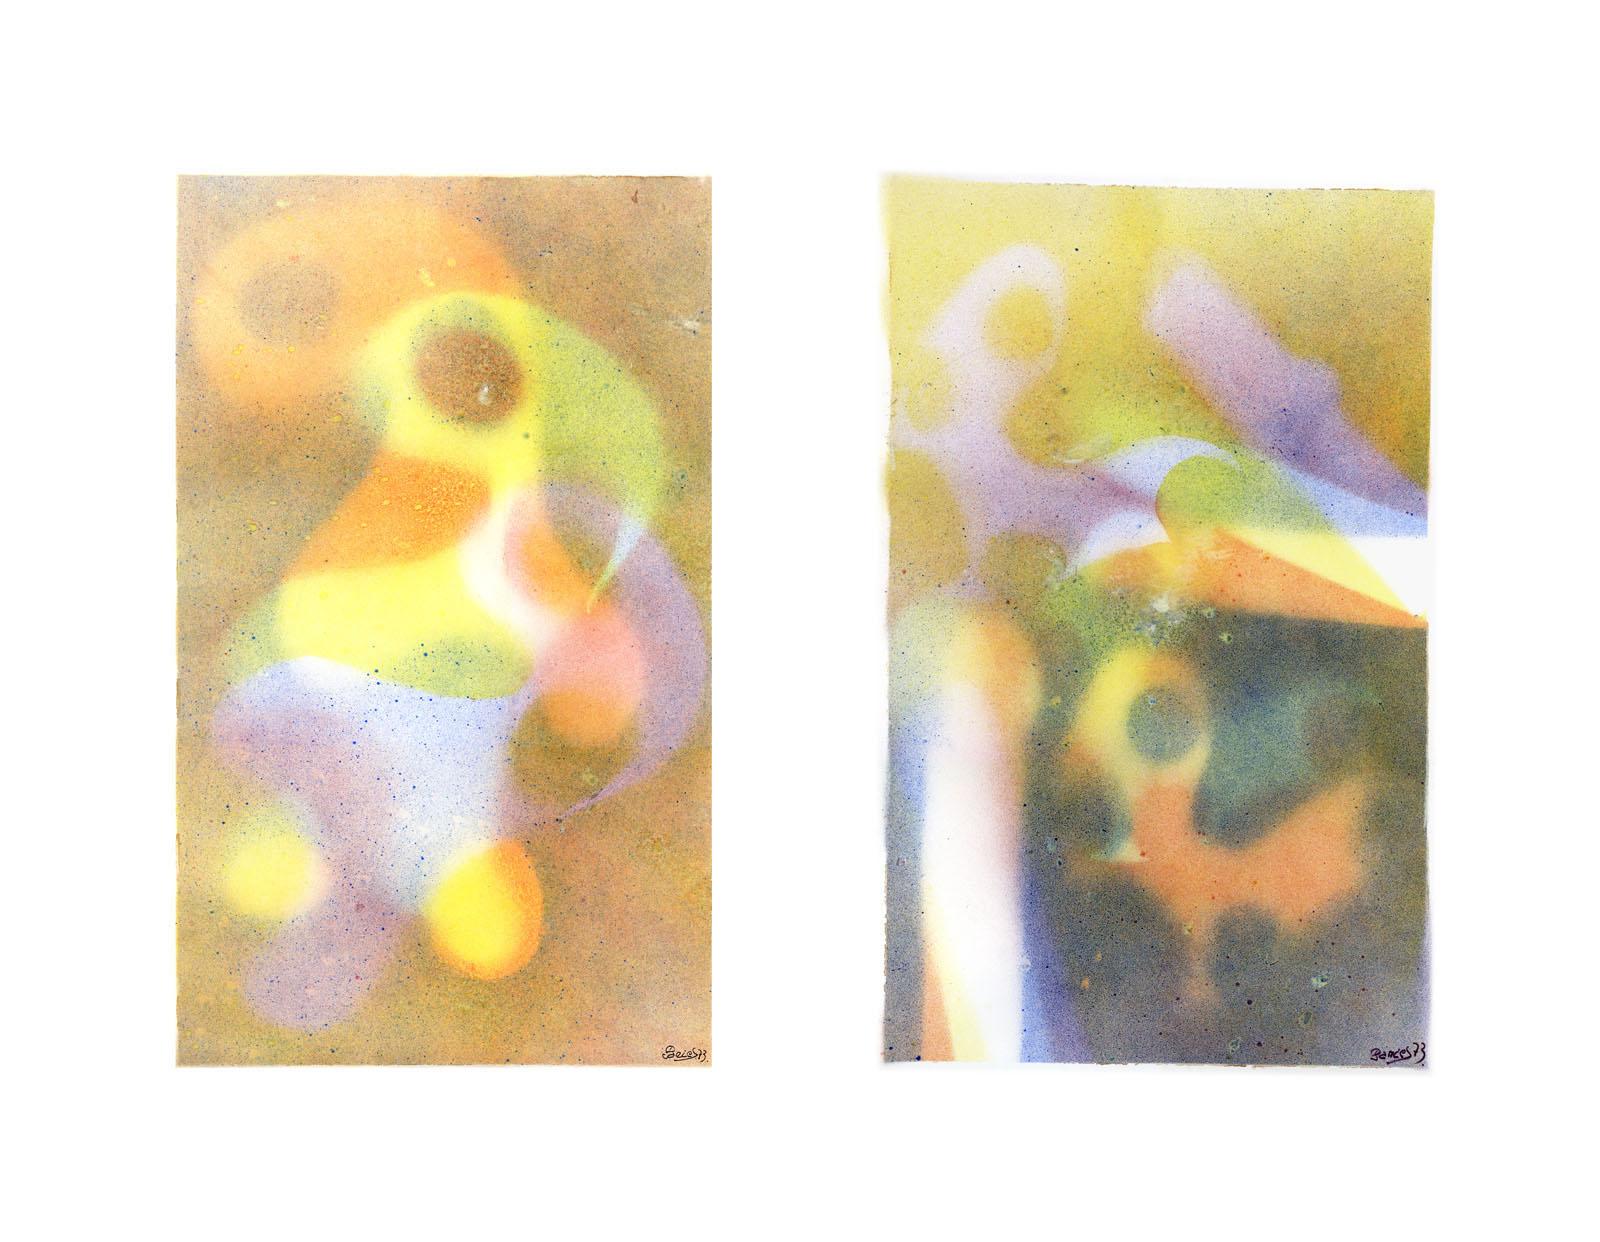 panies-danielvillalobos-spanish-painting-abstract-24